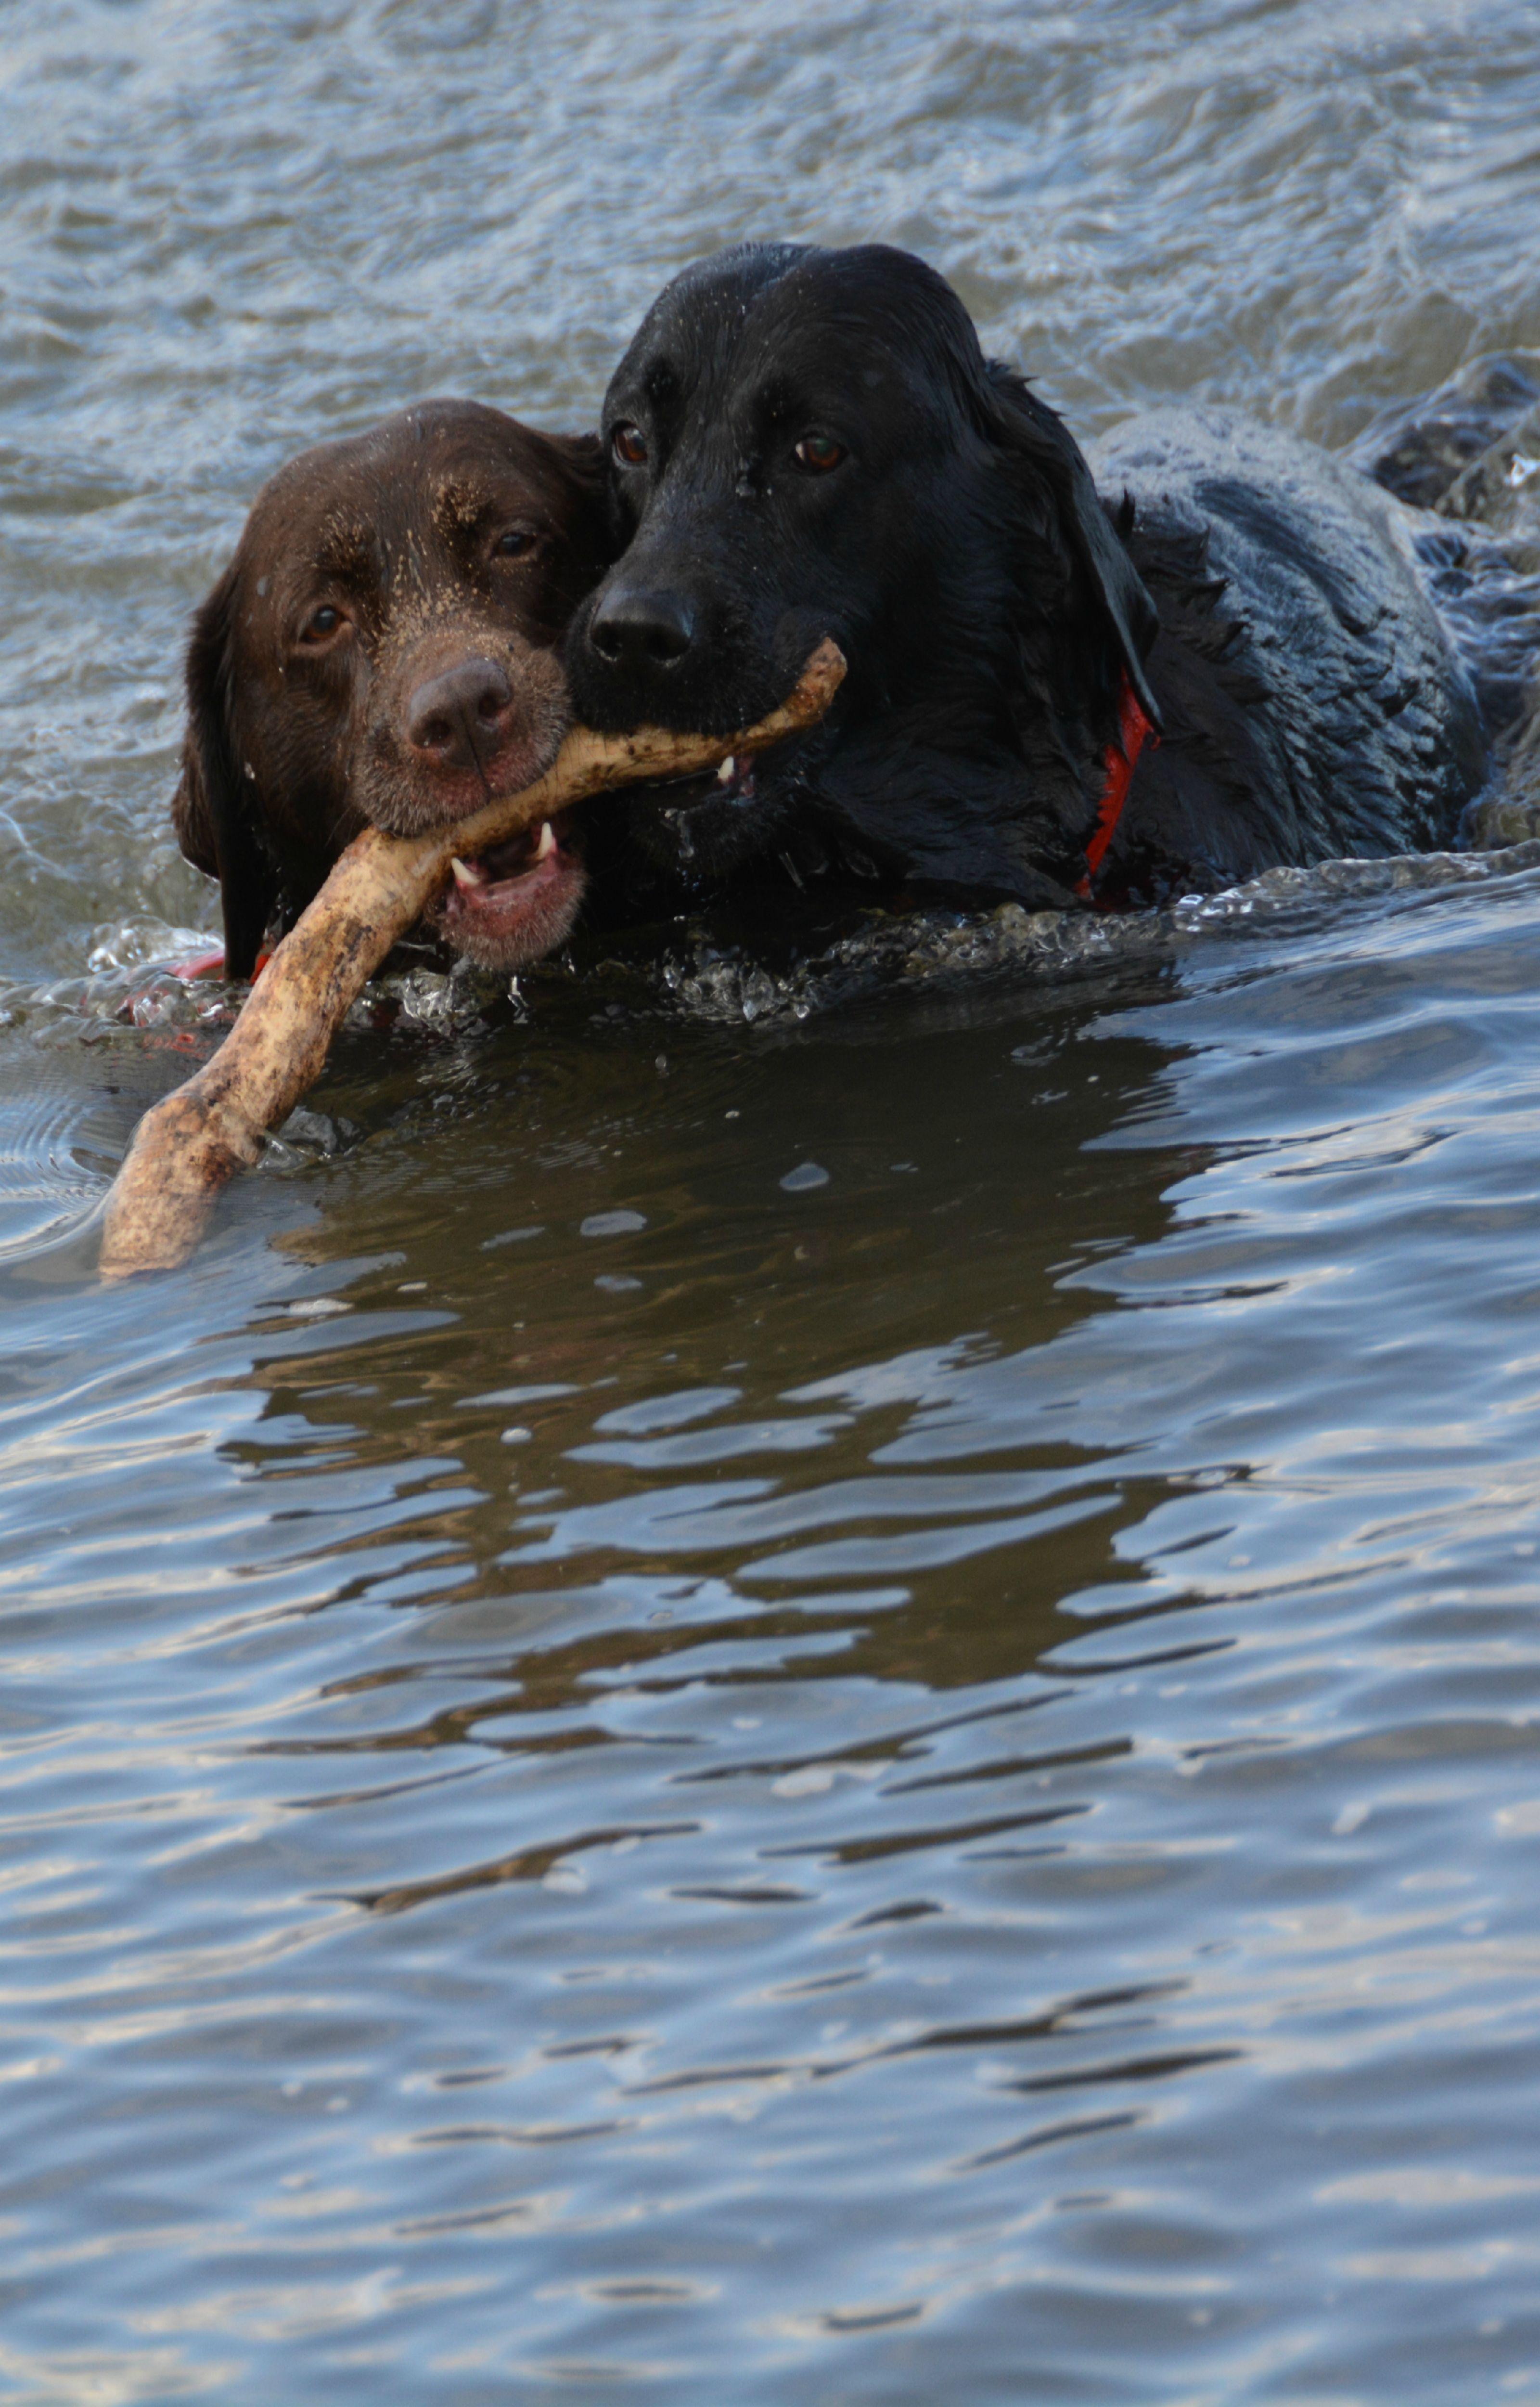 Izzy and bree at the beach Cramond Edinburgh by Wil